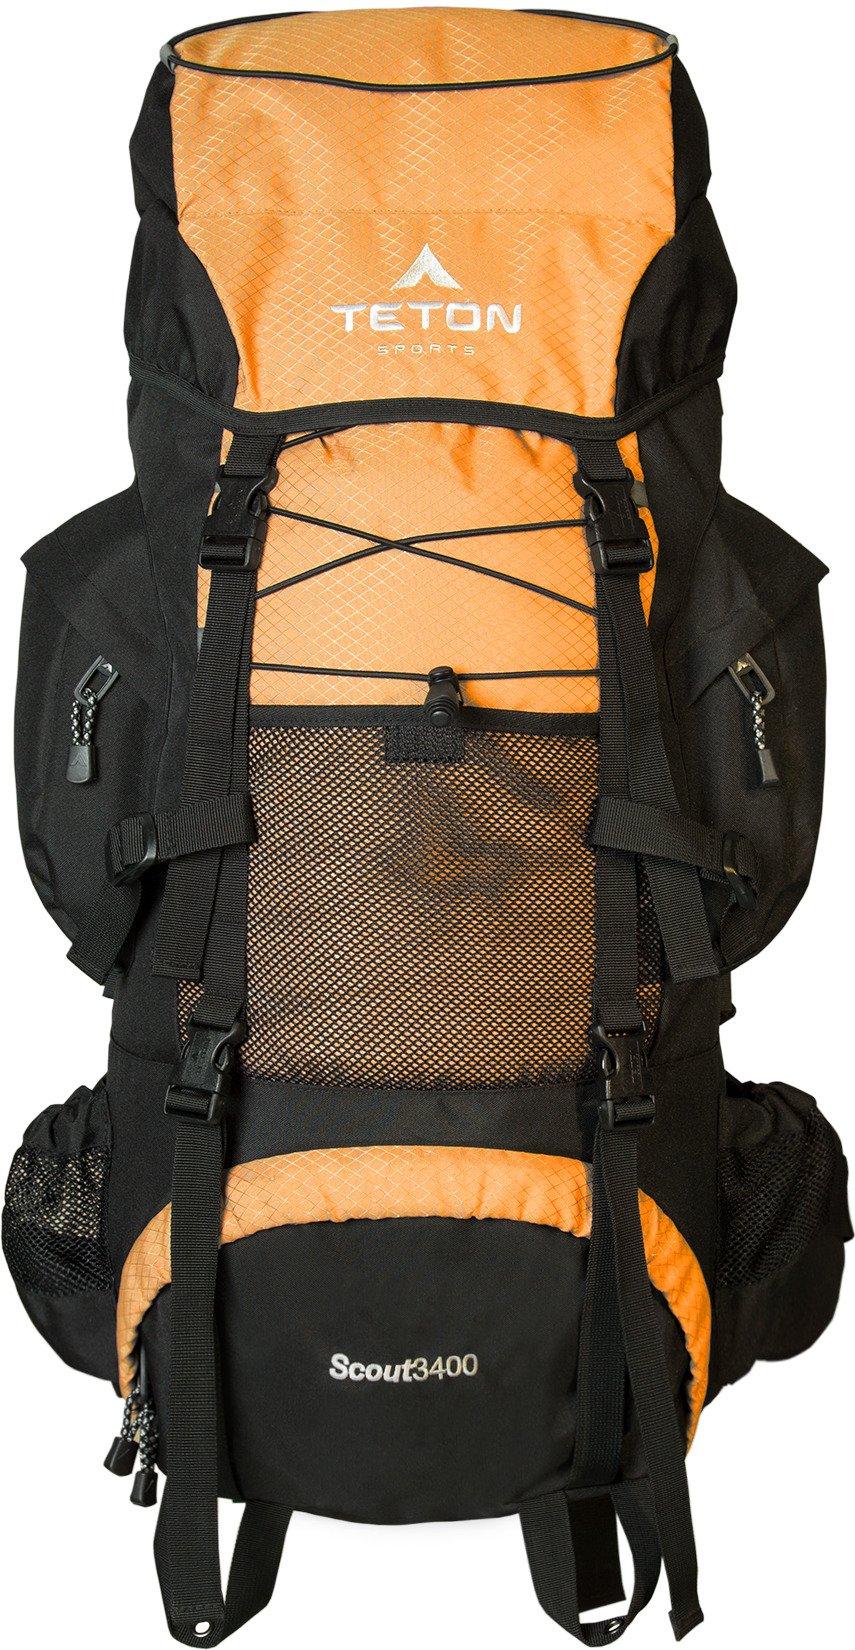 TETON Sports Scout 3400 Internal Frame Backpack  High-Performance Backpack  for Backpacking e64944670b6f7